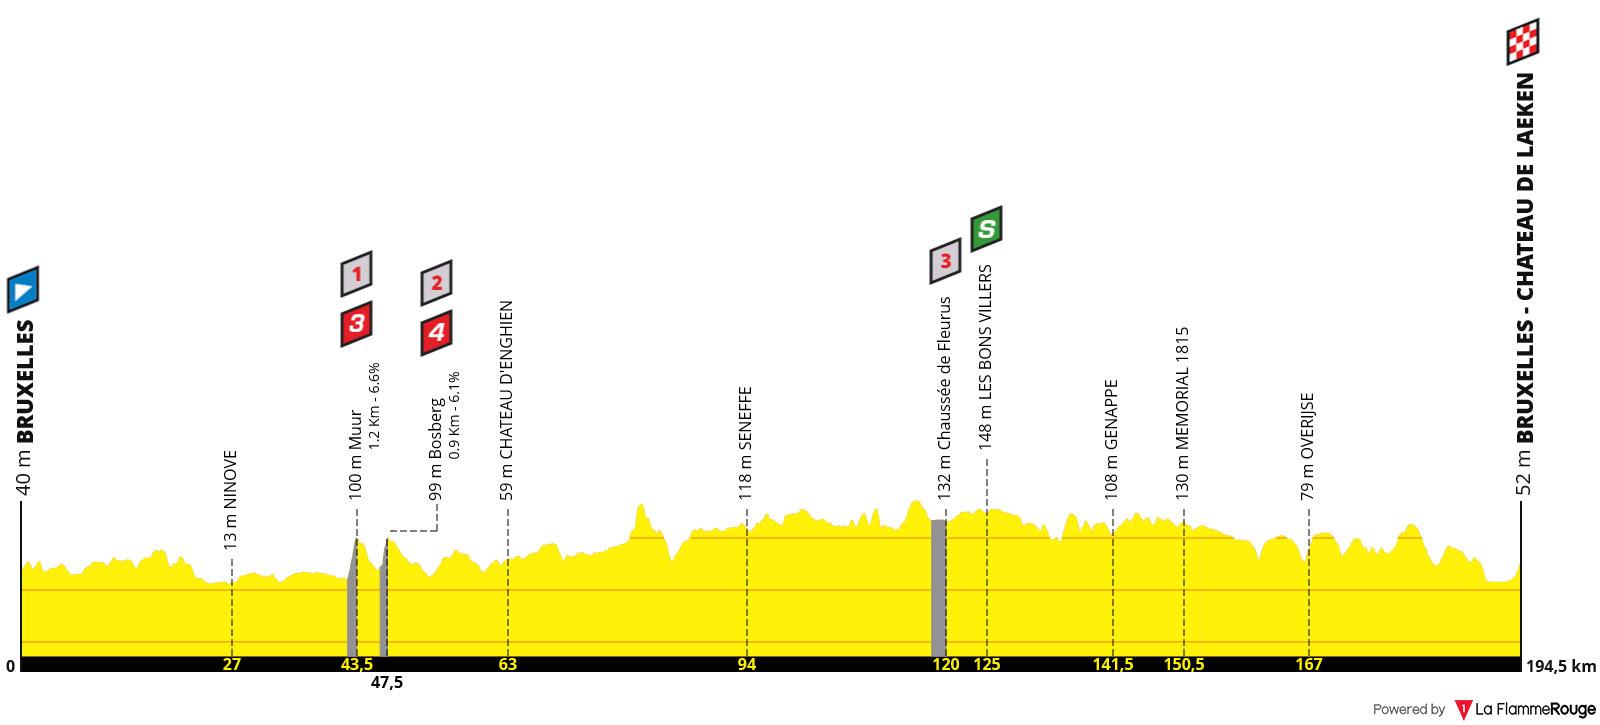 Perfil Etapa 01 - Tour de Francia 2019